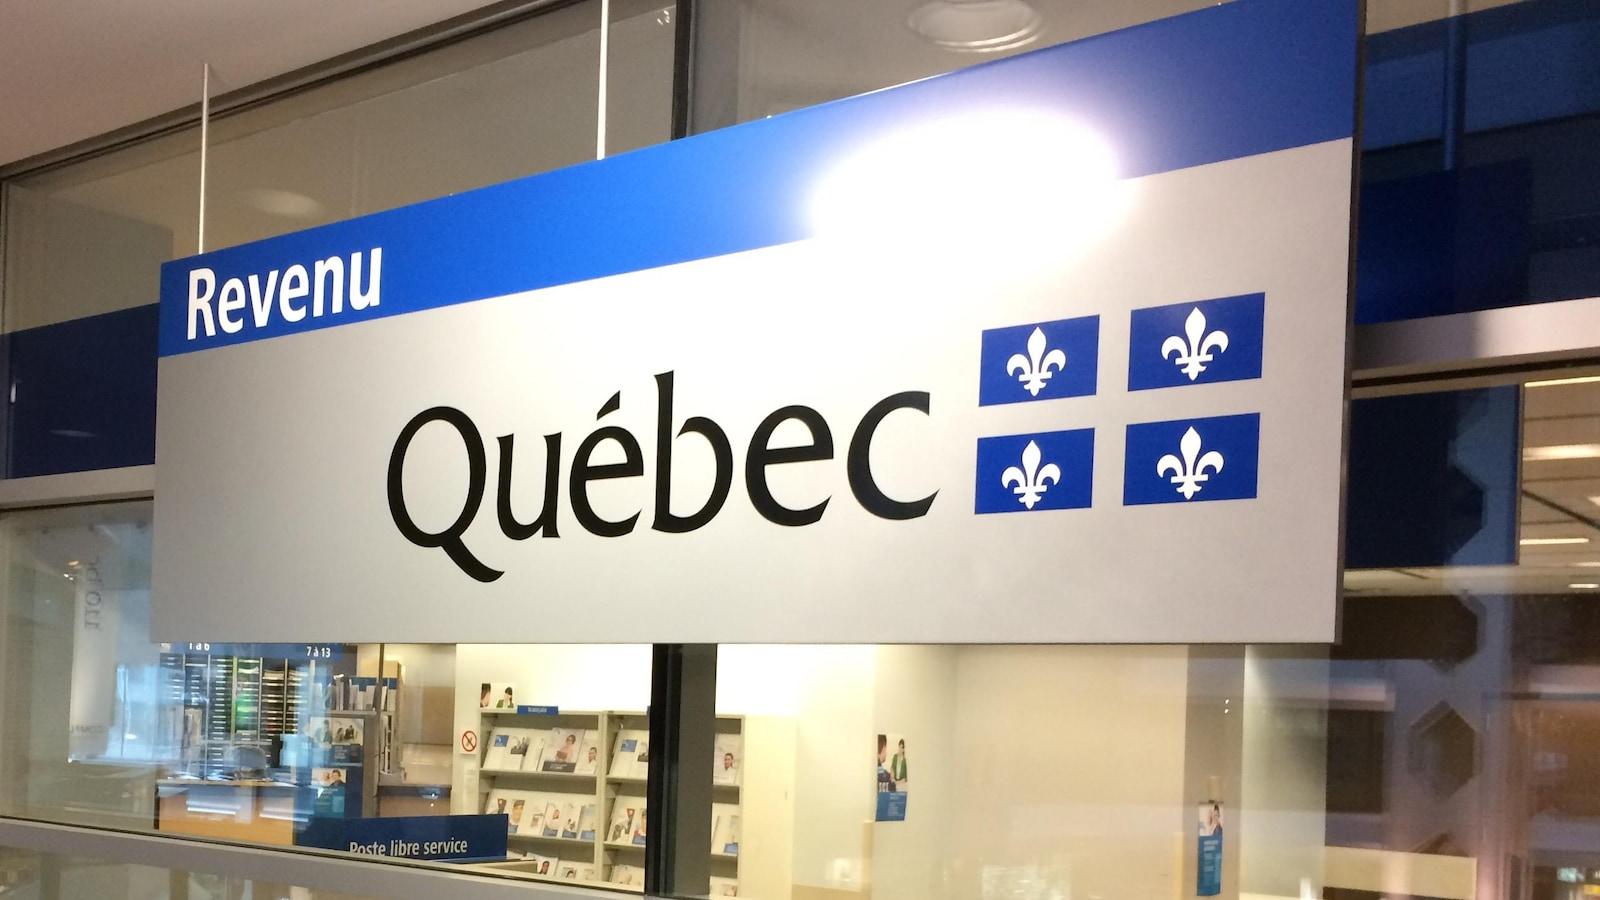 Bureau de Revenu Québec.